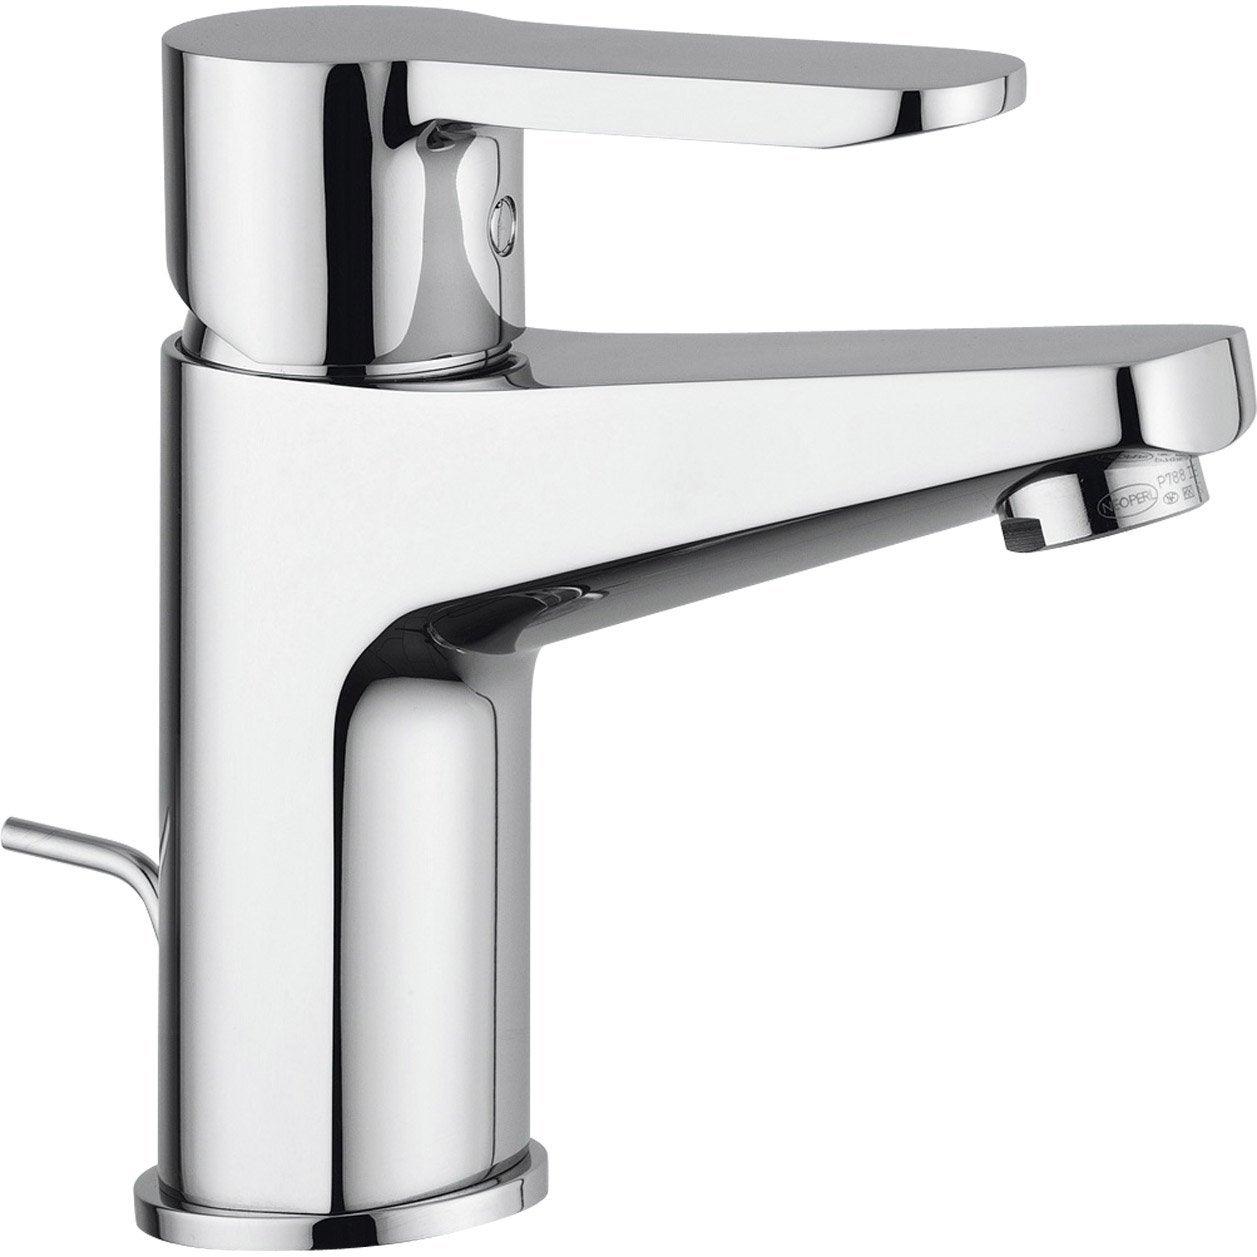 Mitigeur de lavabo bec bas nf medio chrom leroy merlin - Mitigeur lavabo leroy merlin ...